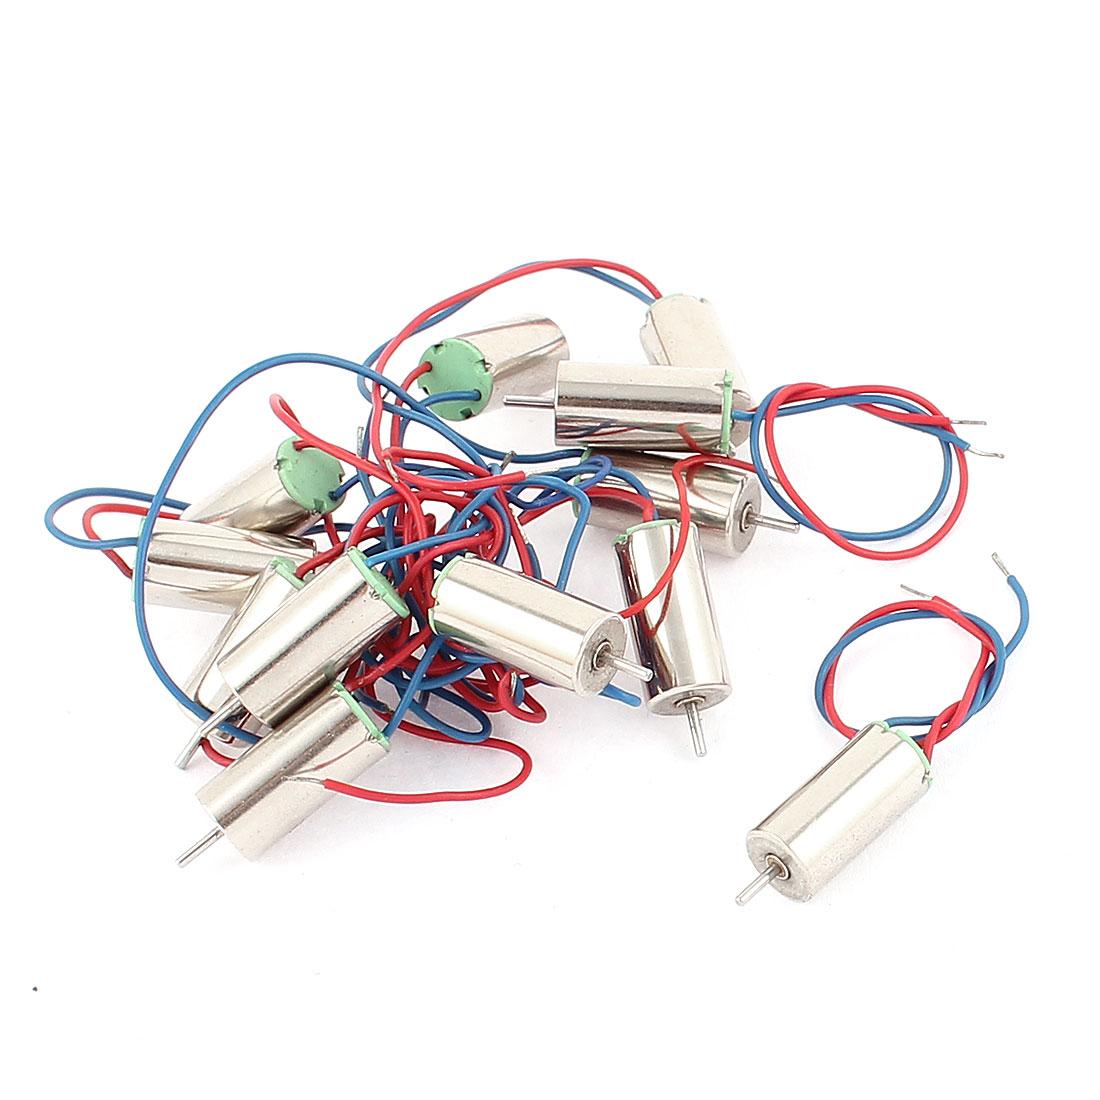 12 Pcs DC 6V 5000RPM High Torque Mini Micro Vibration Motor 6x12mm